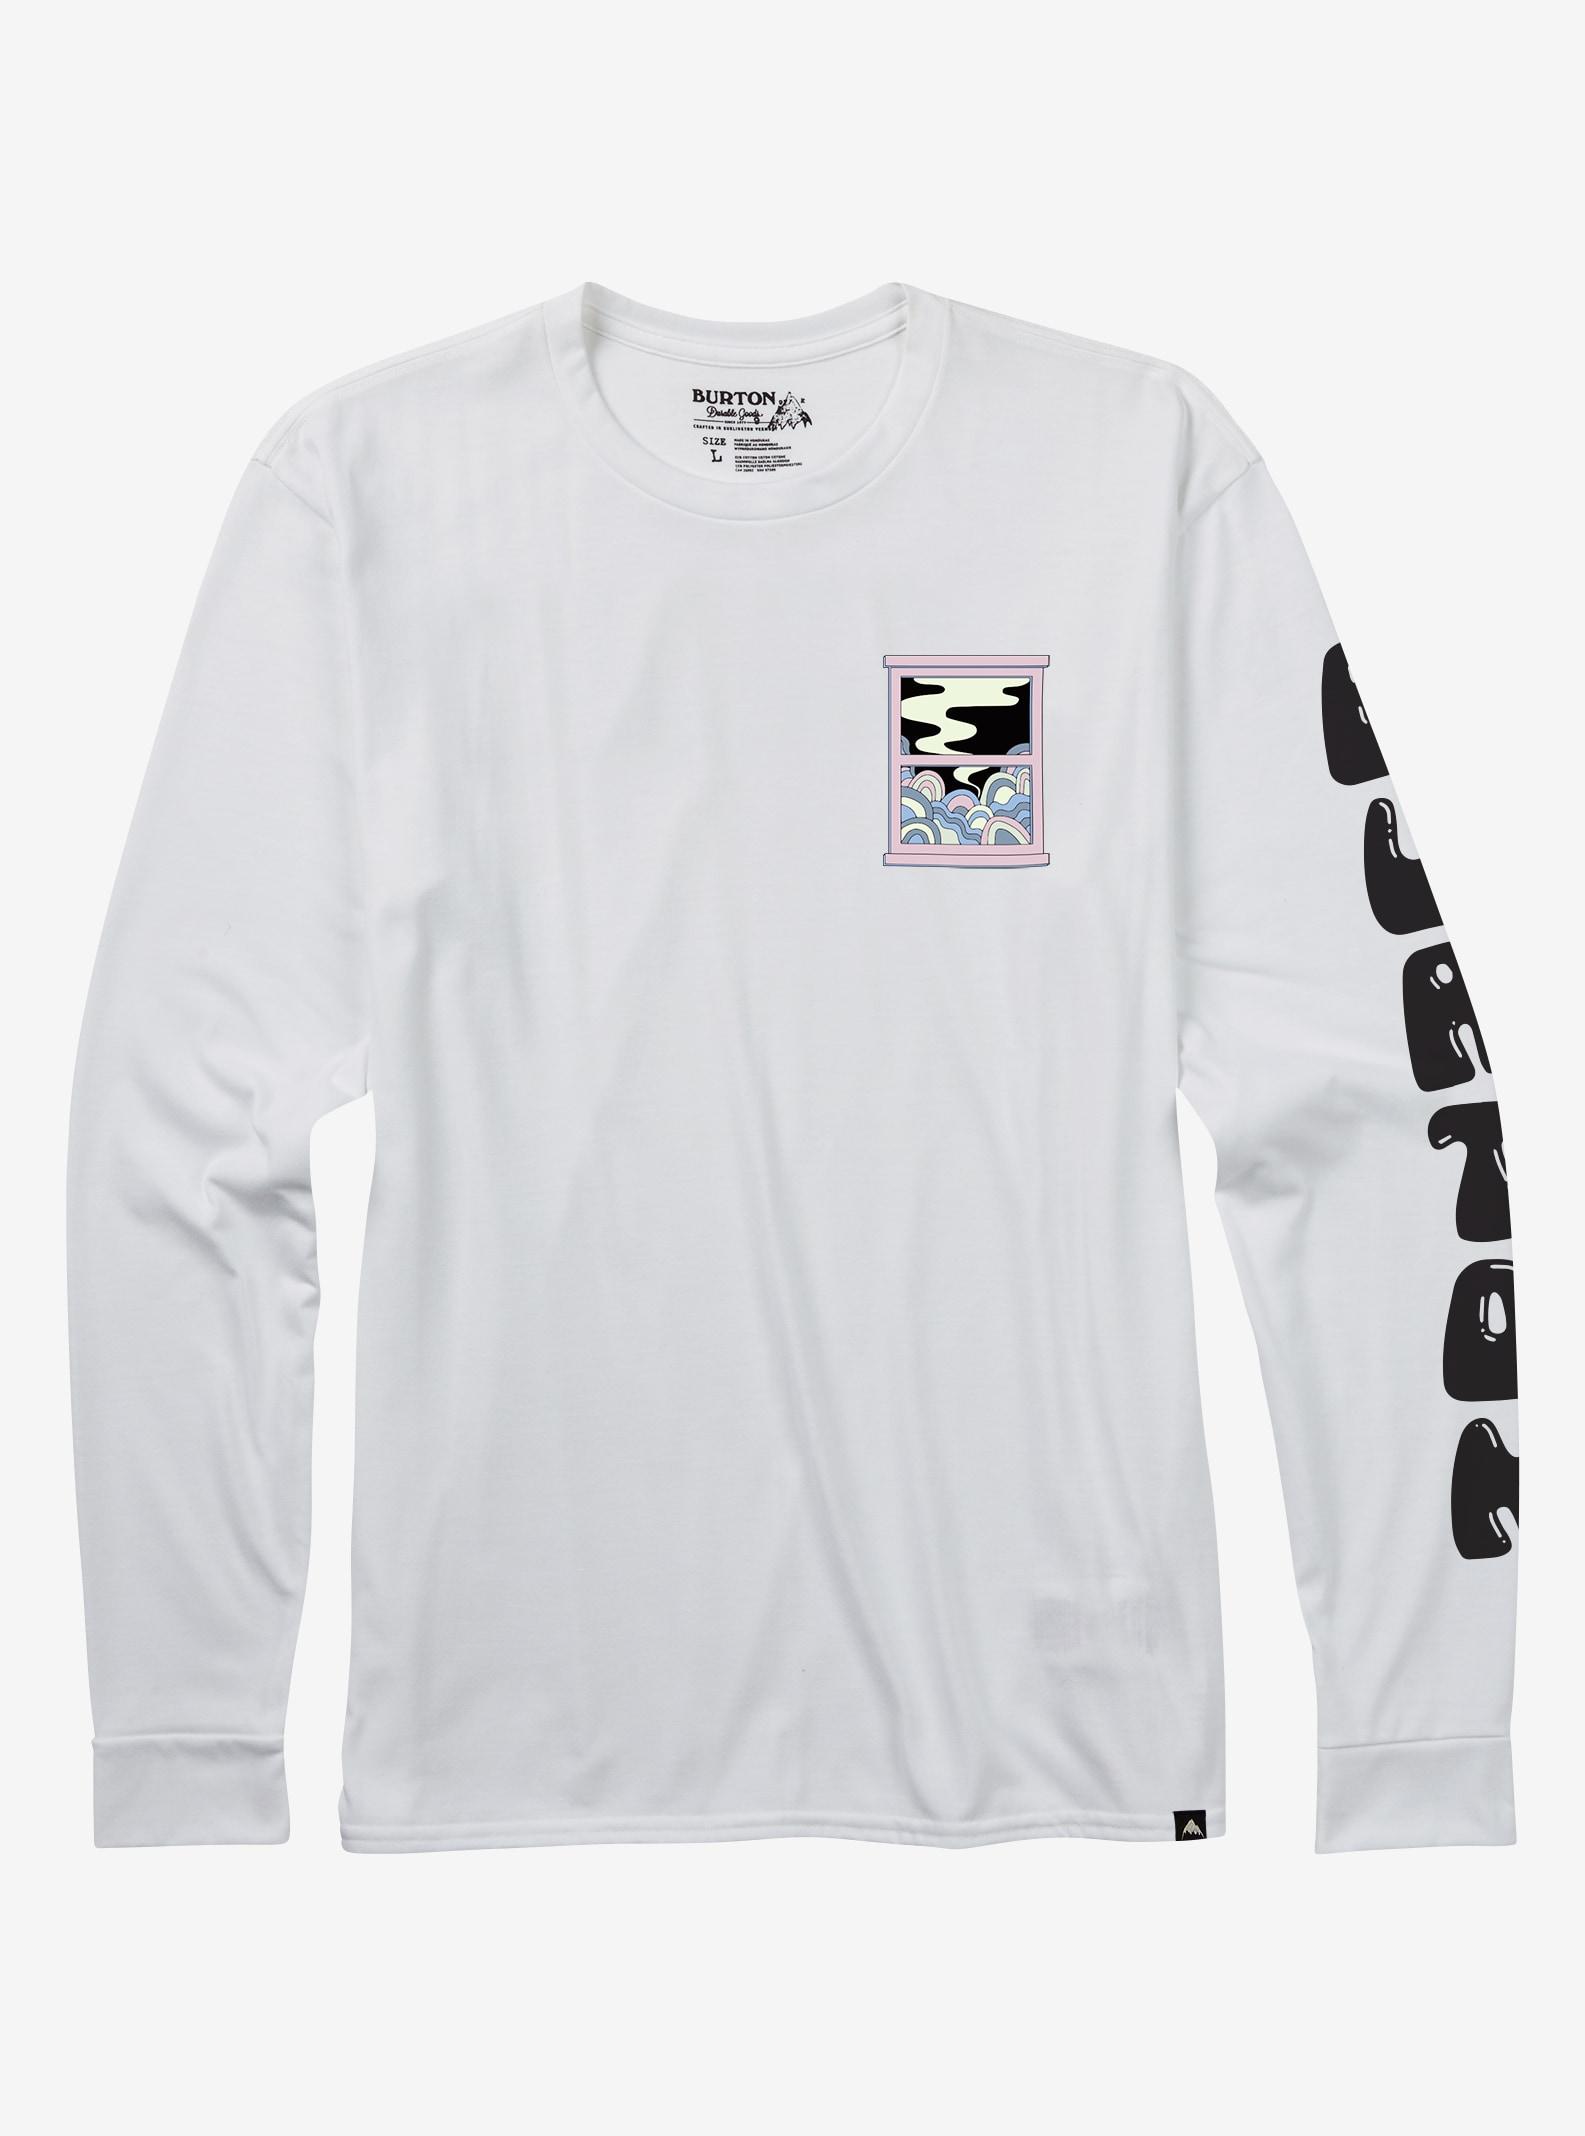 Men's Burton Newport Long Sleeve T Shirt shown in Stout White